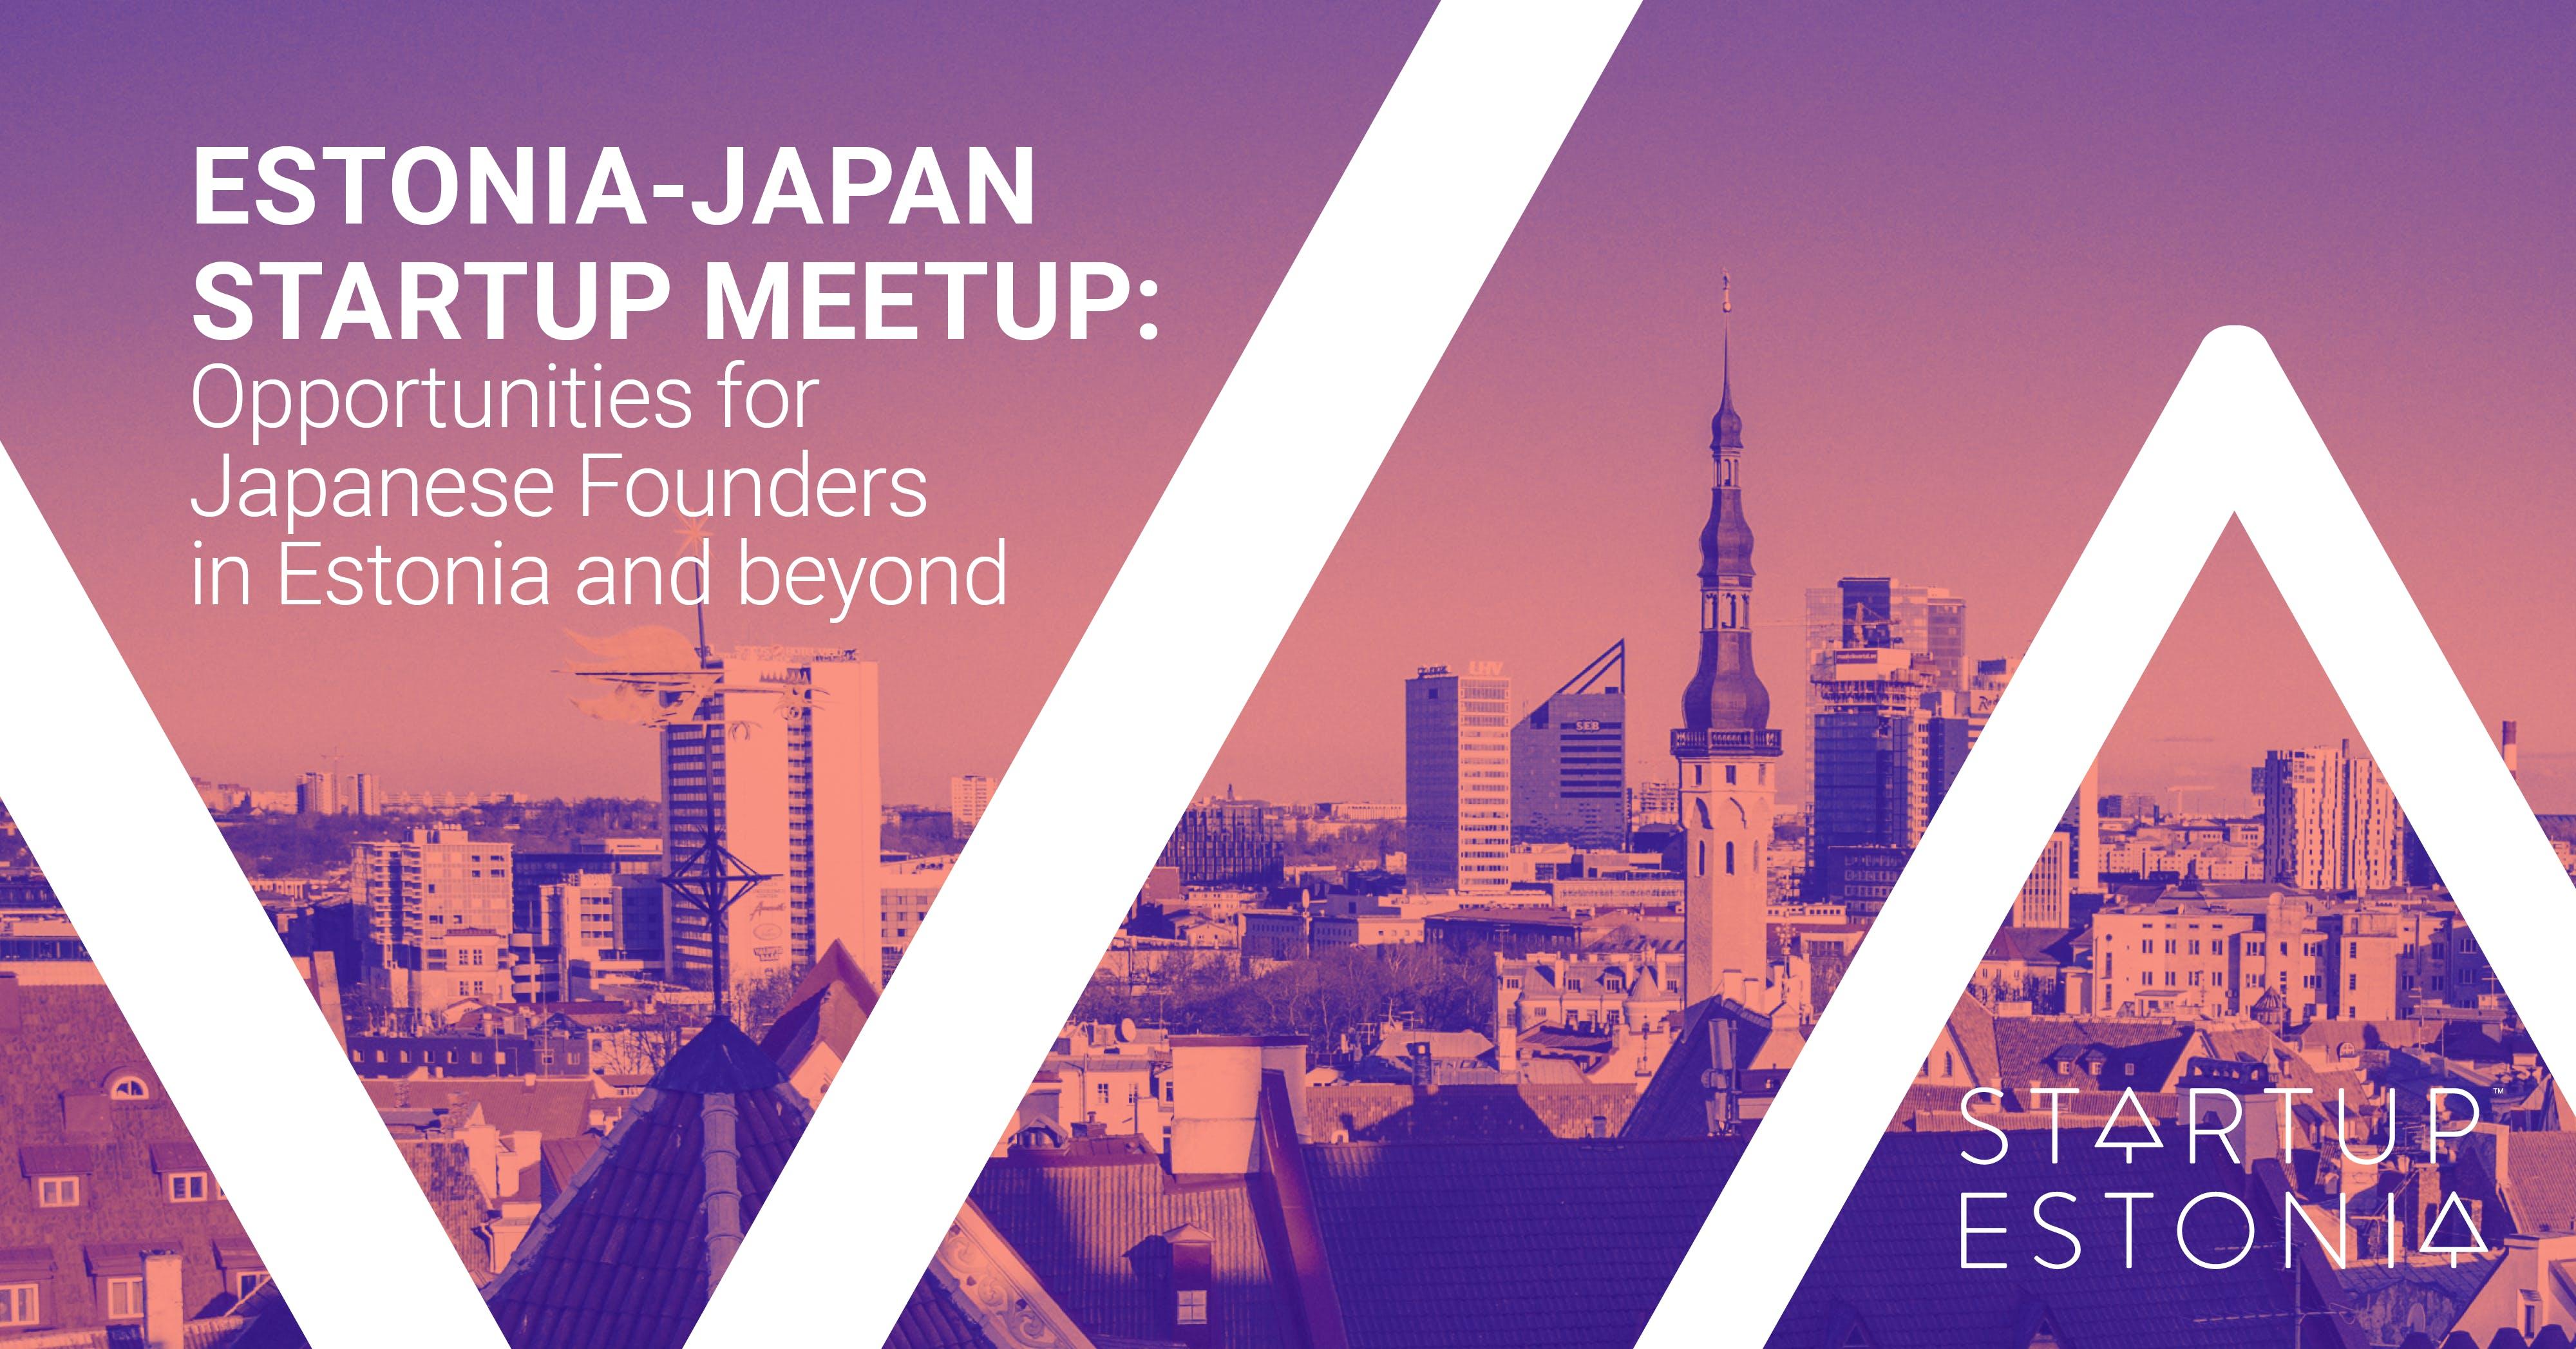 Estonia-Japan Startup Meetup